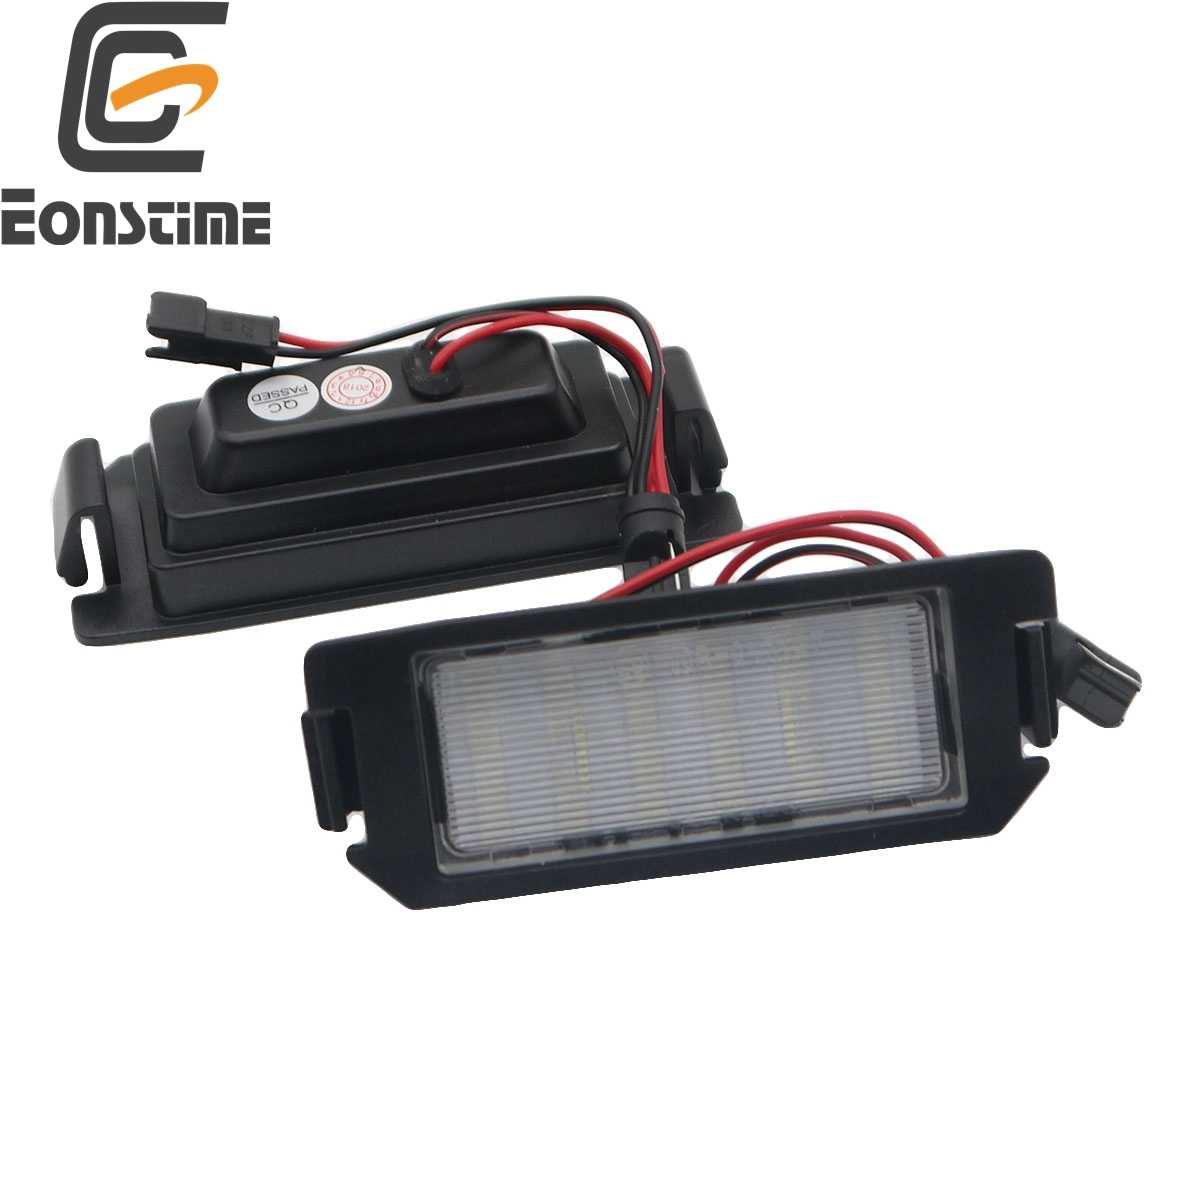 Eonstime 2x 18SMD éclairage de plaque d'immatriculation LED pour Hyundai I10 I20 tiburon coupé Veloster FS XG30 terran HP Kia Rio Picanto TA Soul